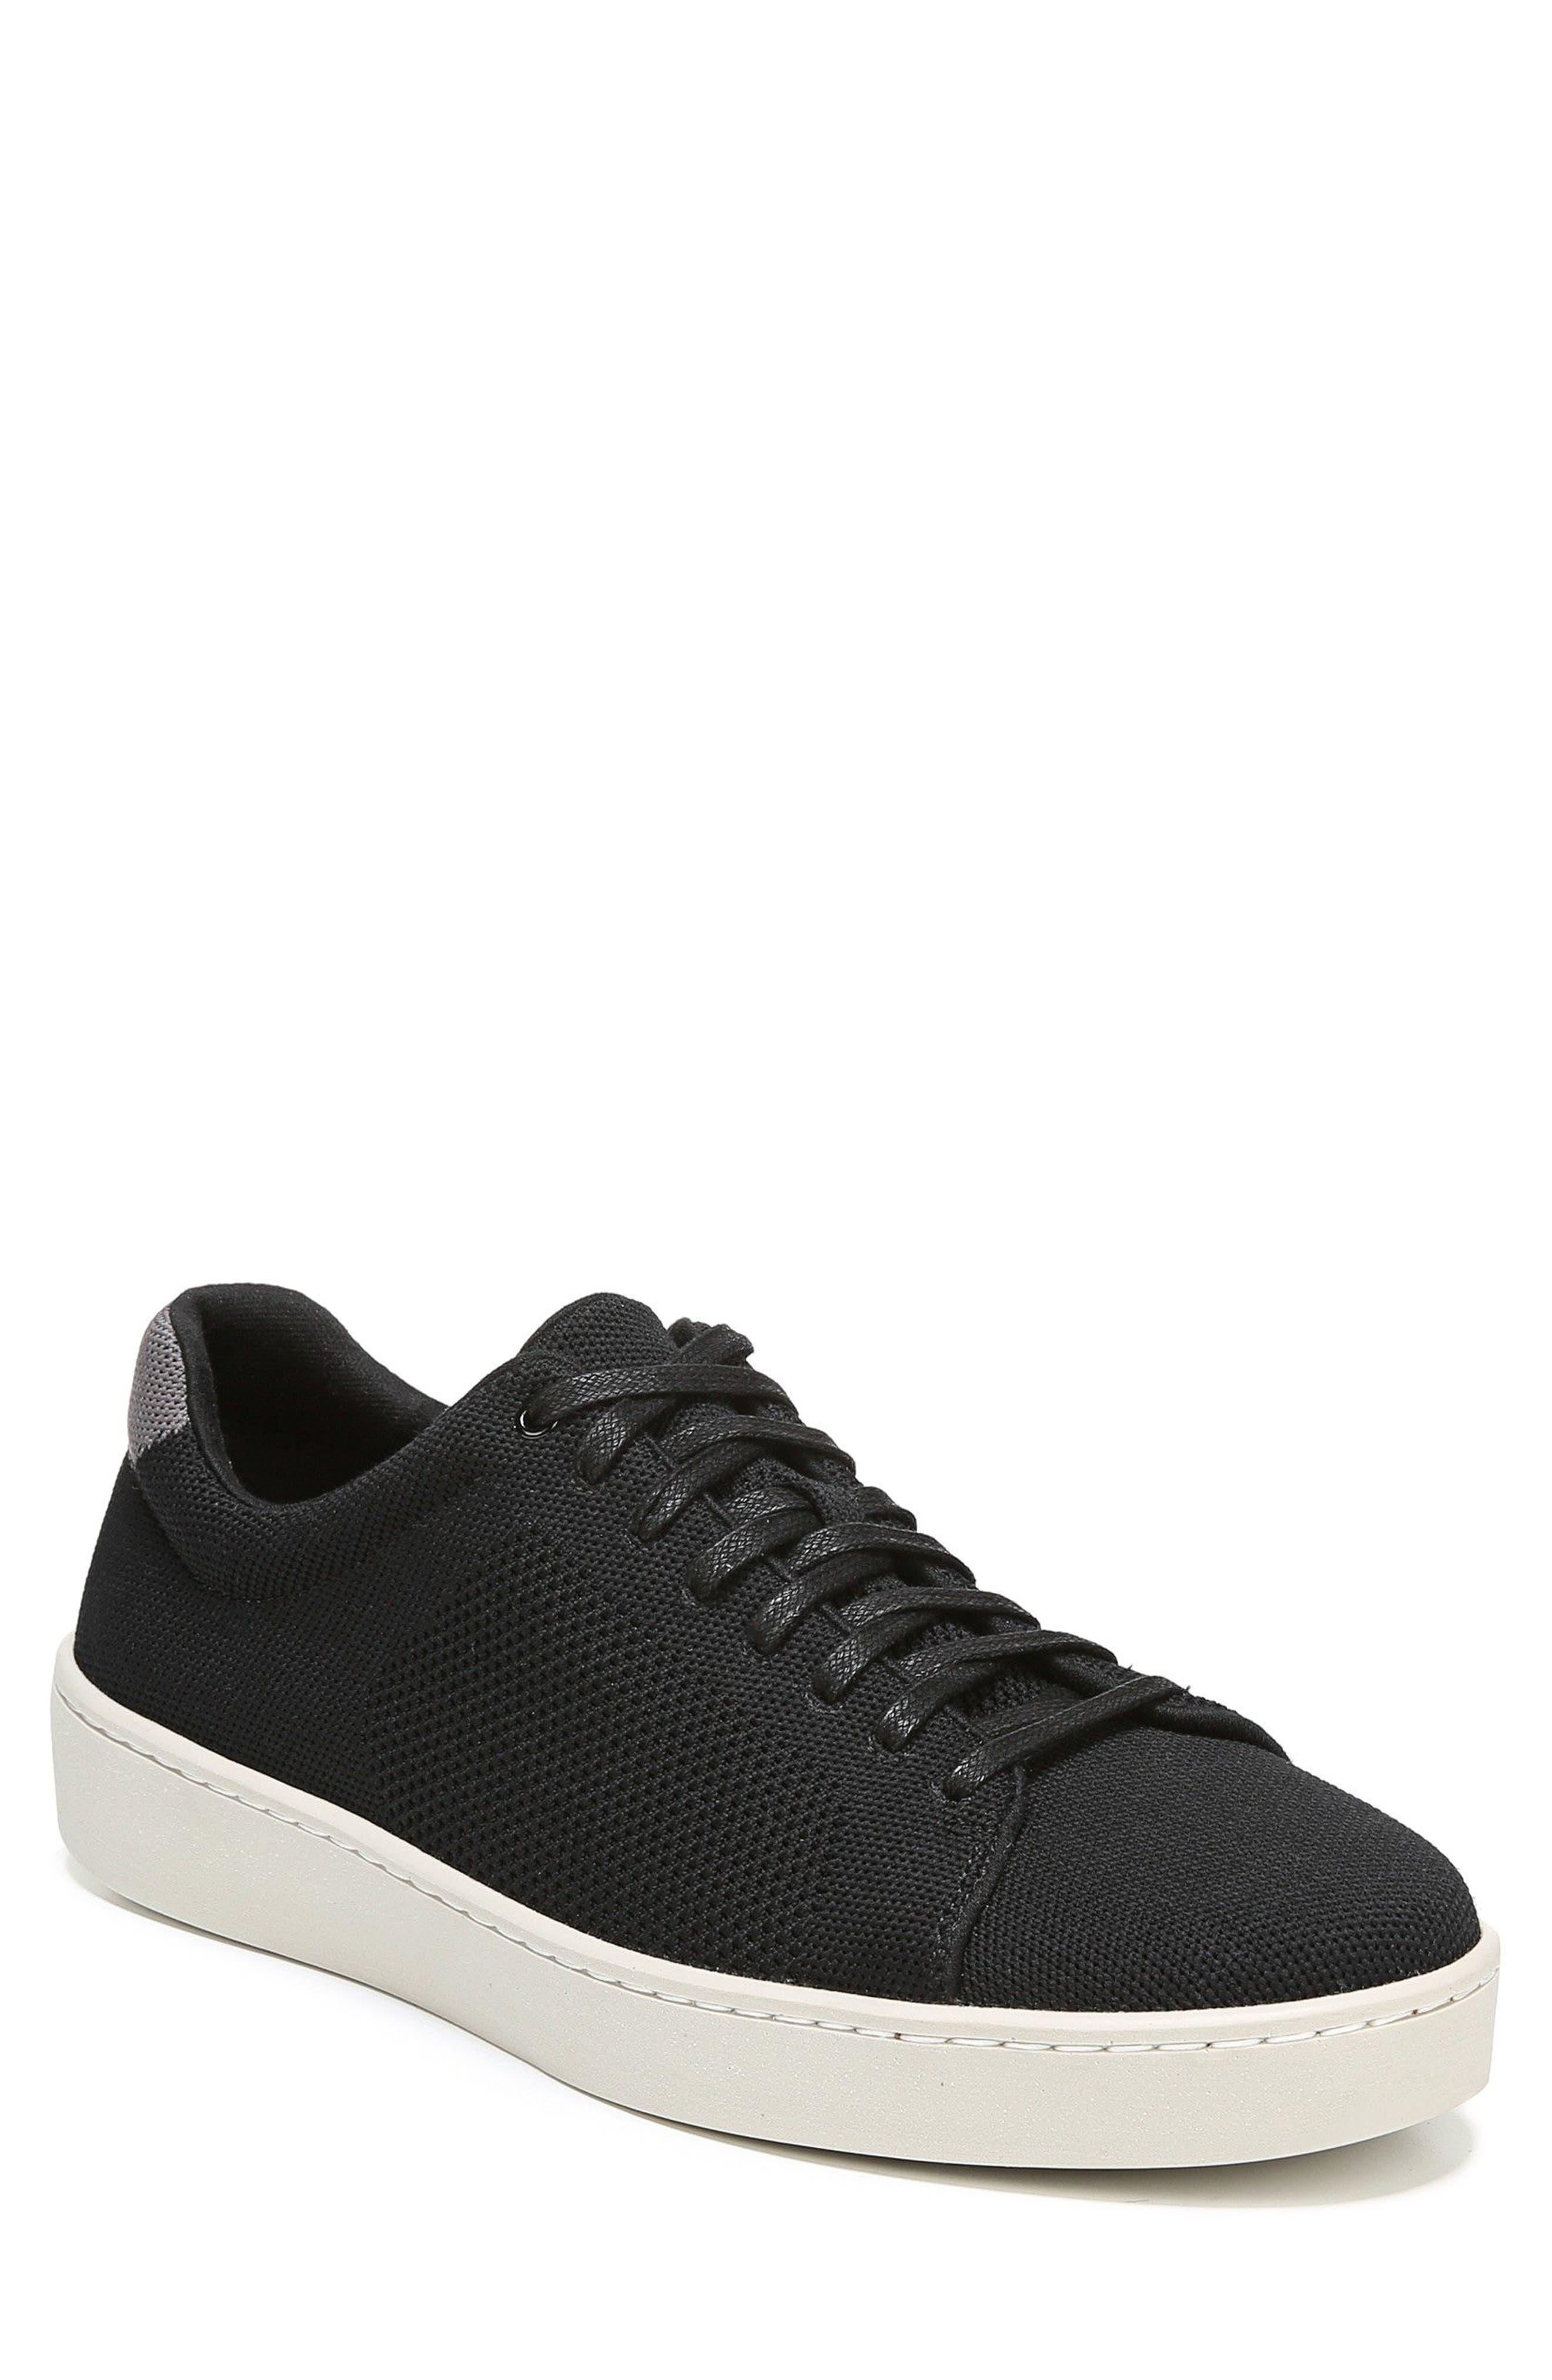 Silos Knit Low Top Sneaker,                             Main thumbnail 1, color,                             BLACK/ GRAPHITE